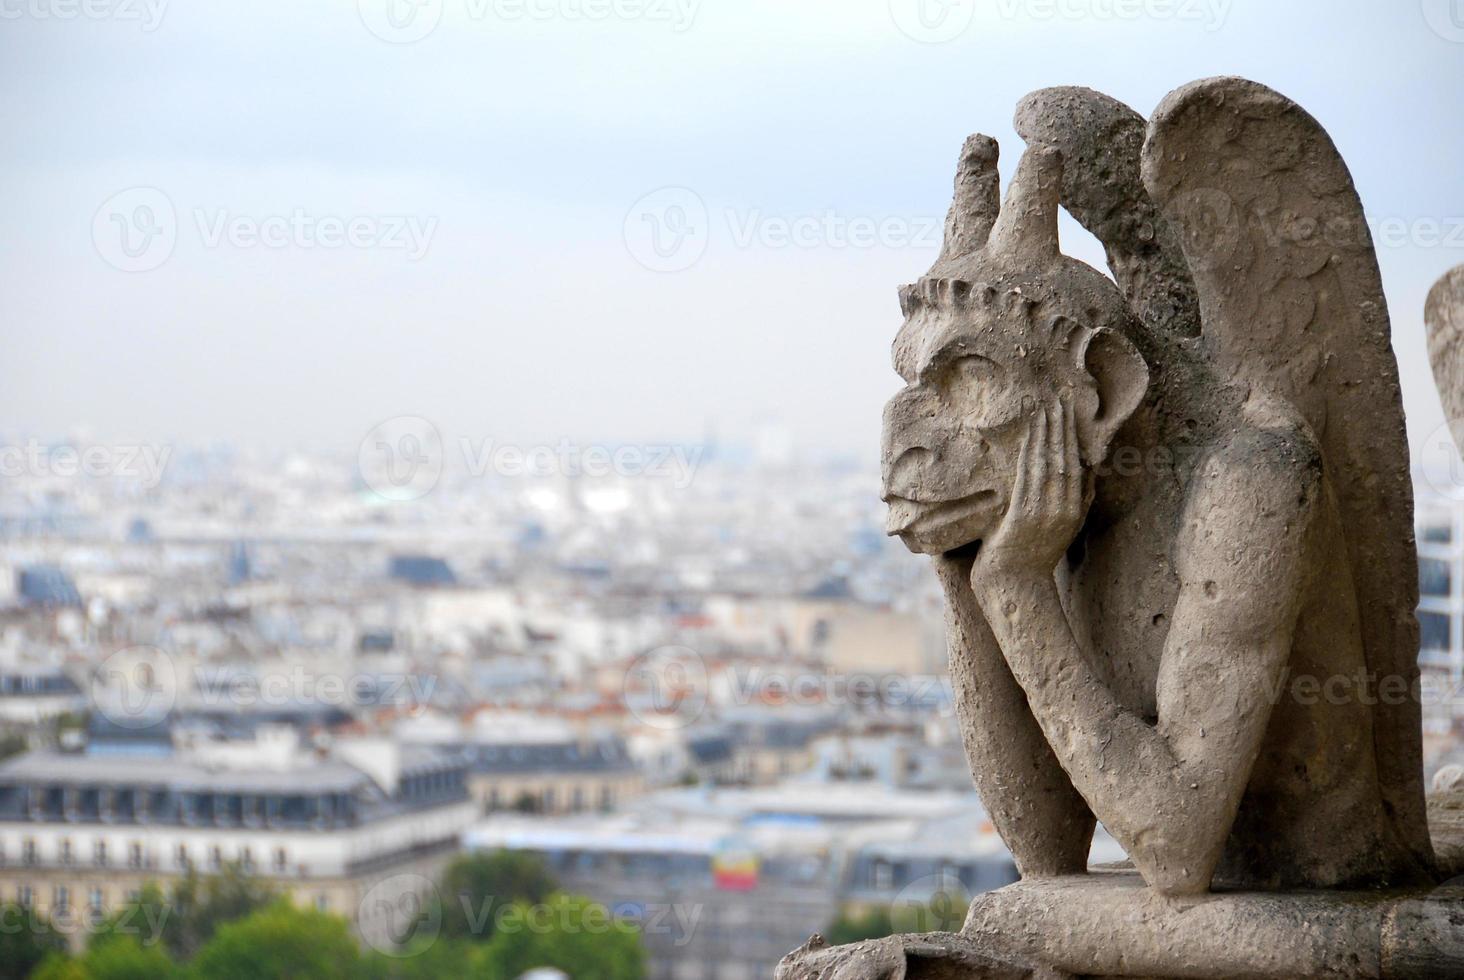 Chimäre, Groteske, Wasserspeier, Dämon, Notre Dame Paris, Frankreich. September foto